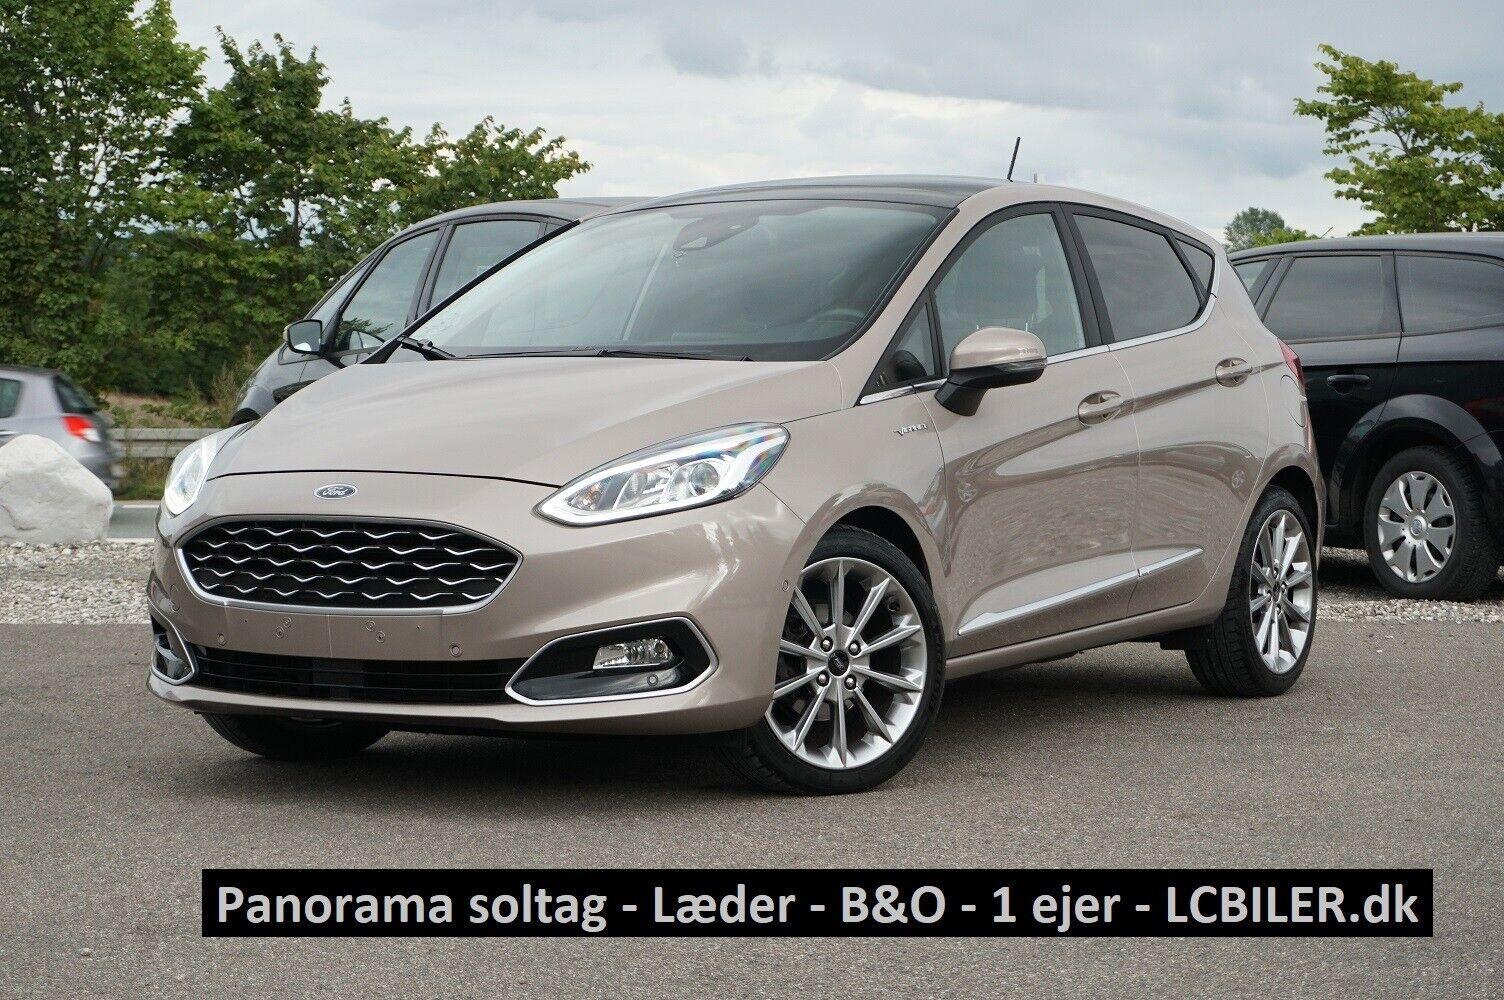 Ford Fiesta 1,0 EcoBoost Vignale 5d - 179.990 kr.